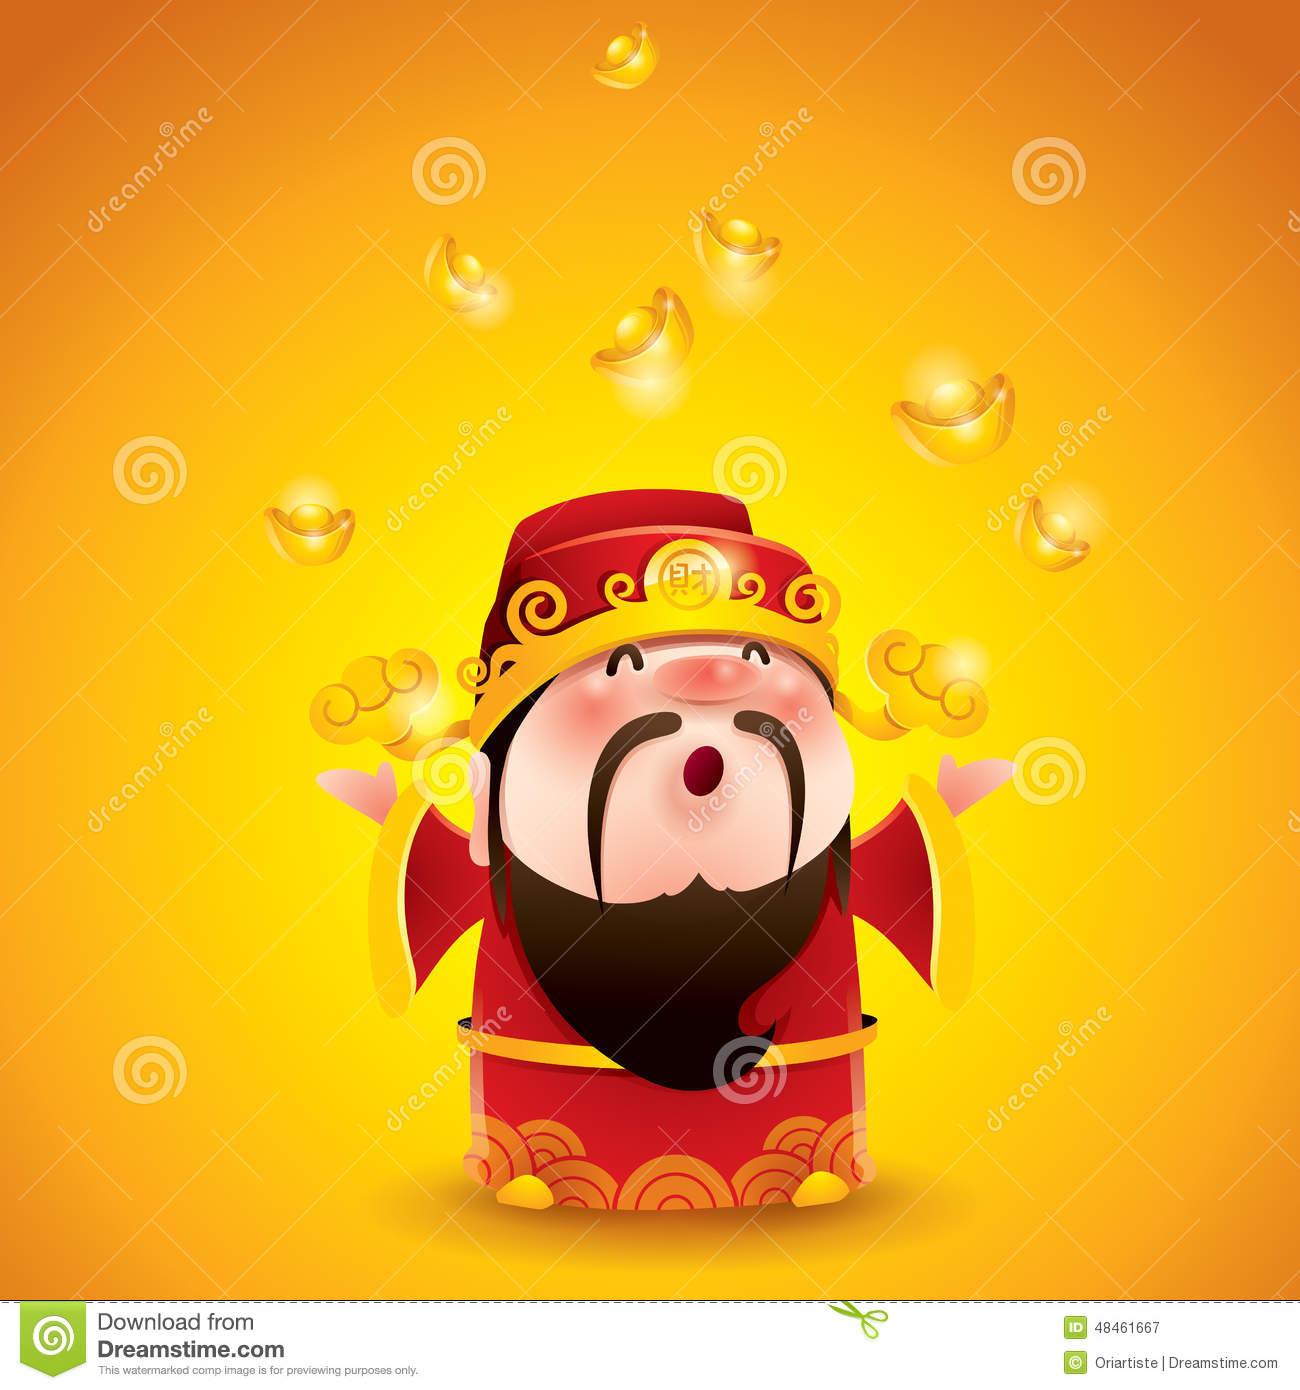 Chinese God Of Wealth. Falling Gold Bullions. Stock Illustration.